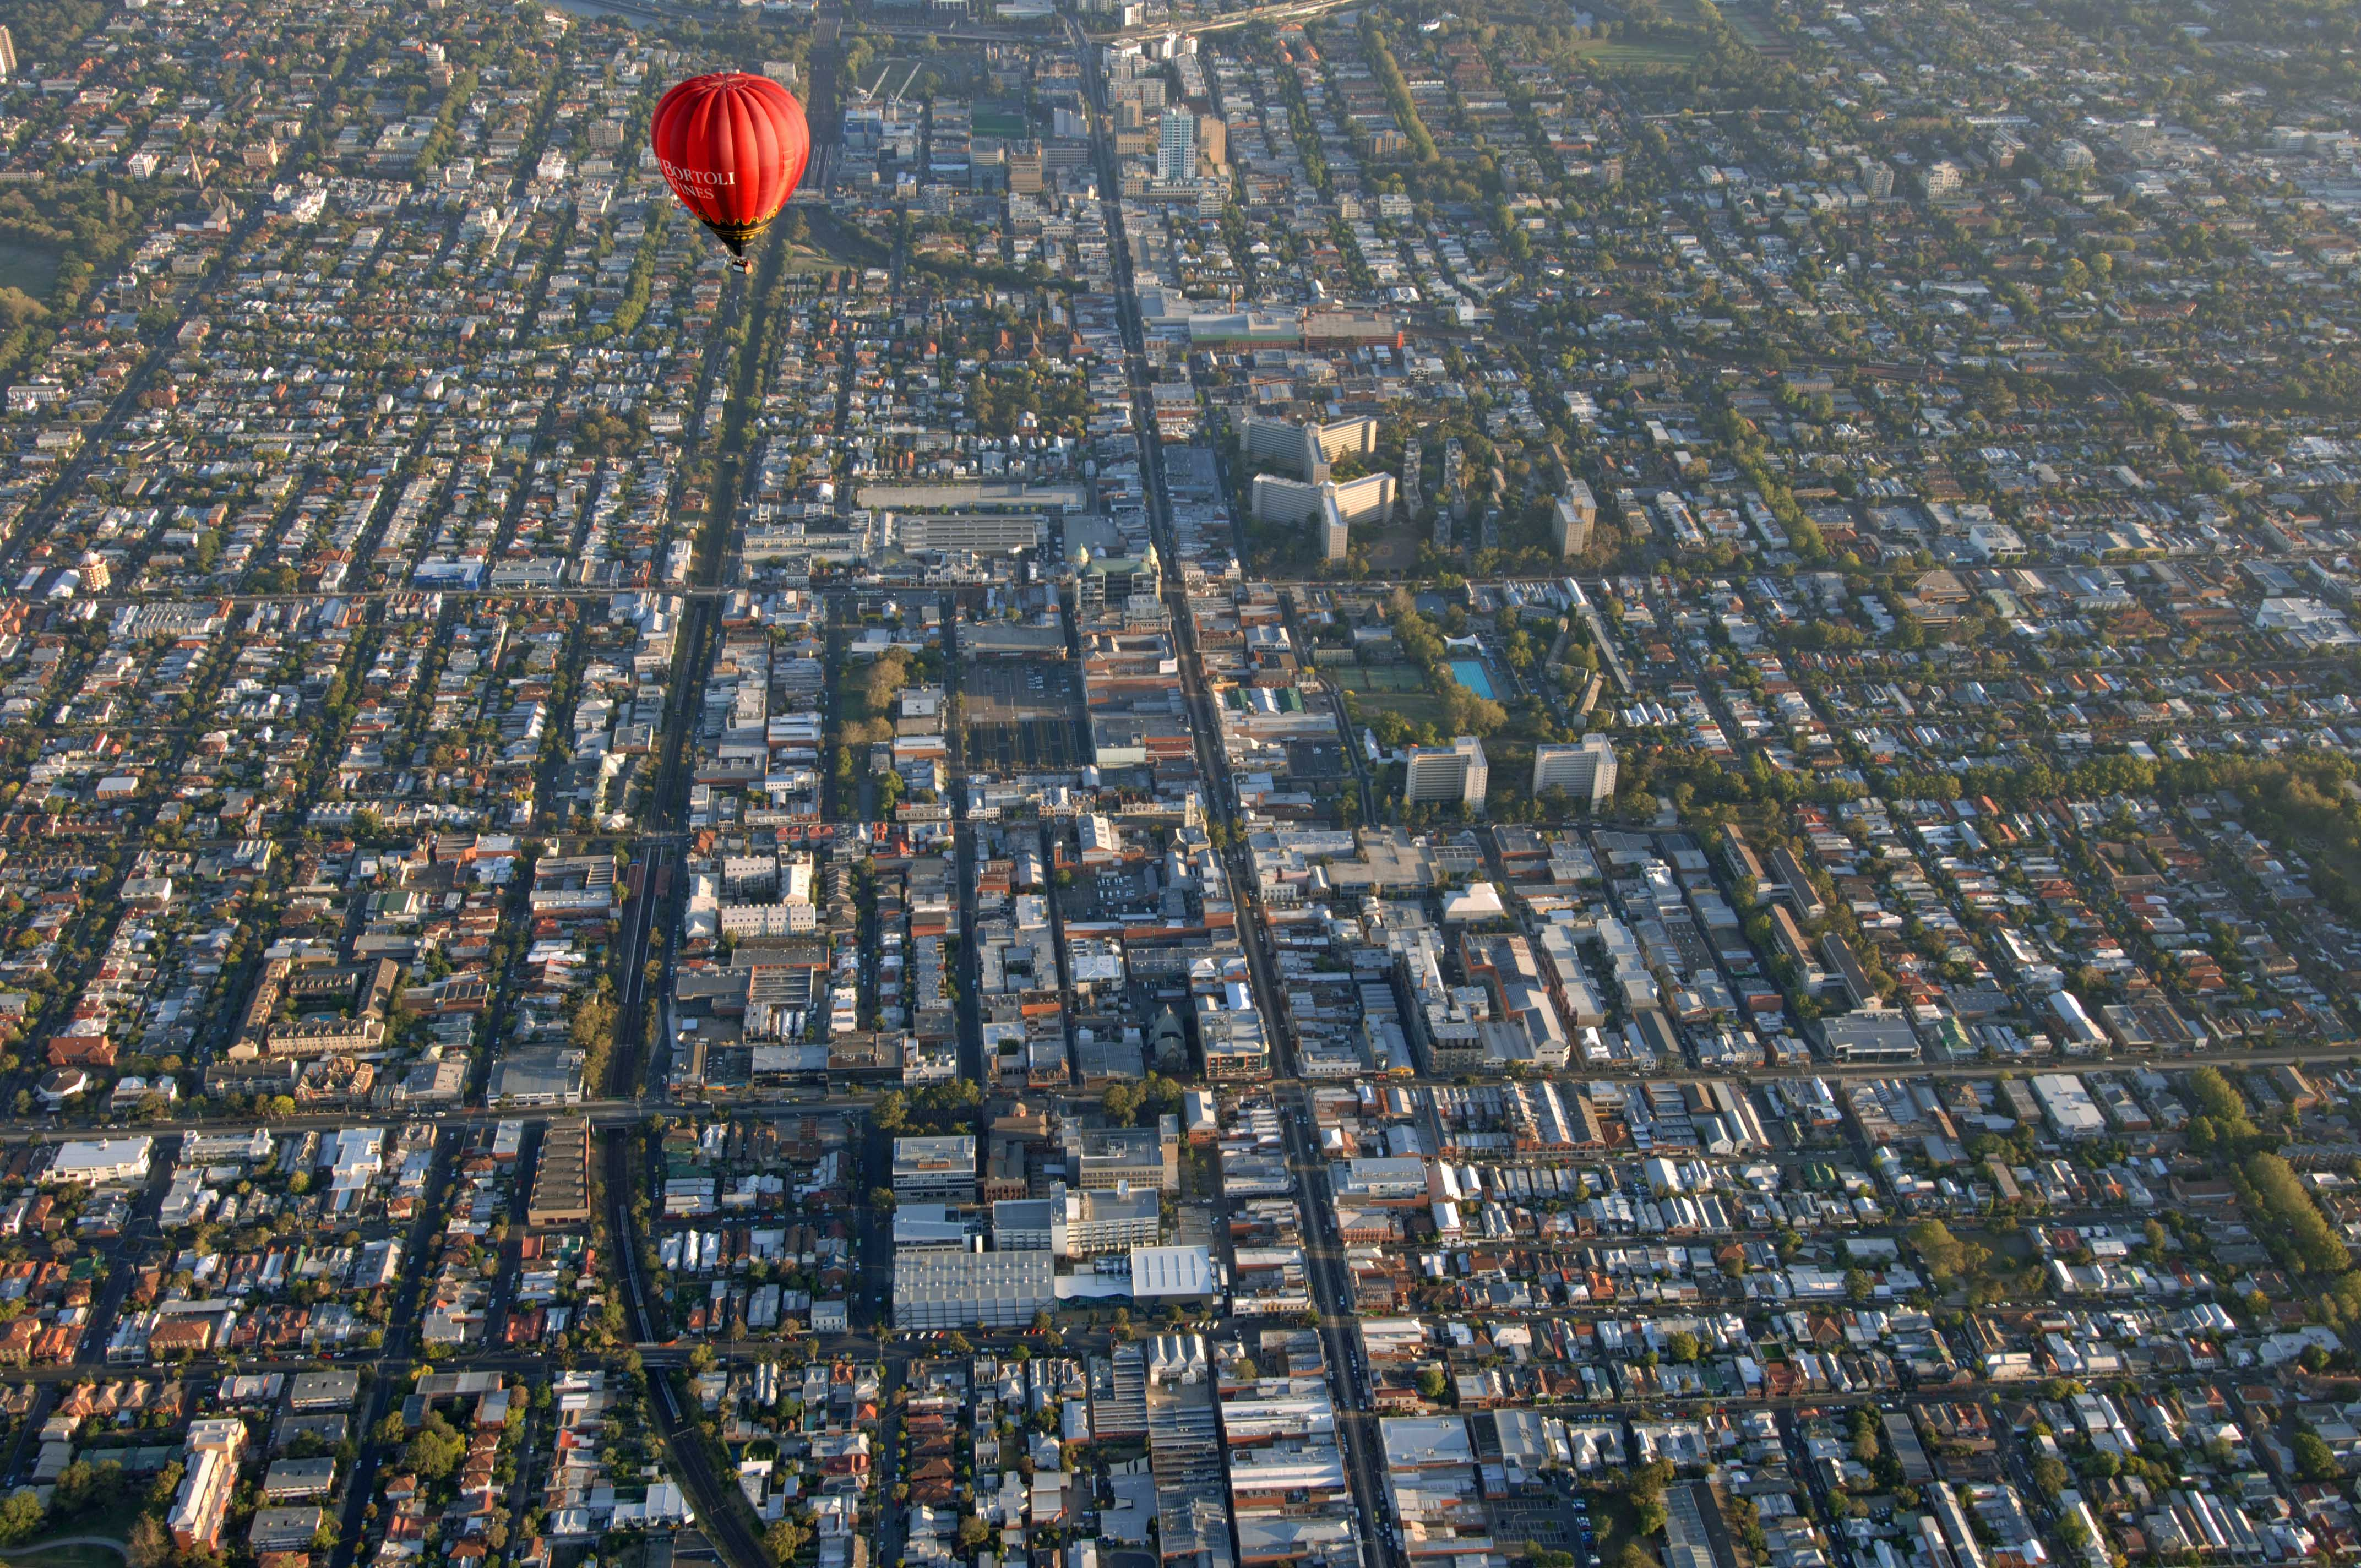 TD02571. Balloon flight over Melbourne. Australia. 1.2.07.crop